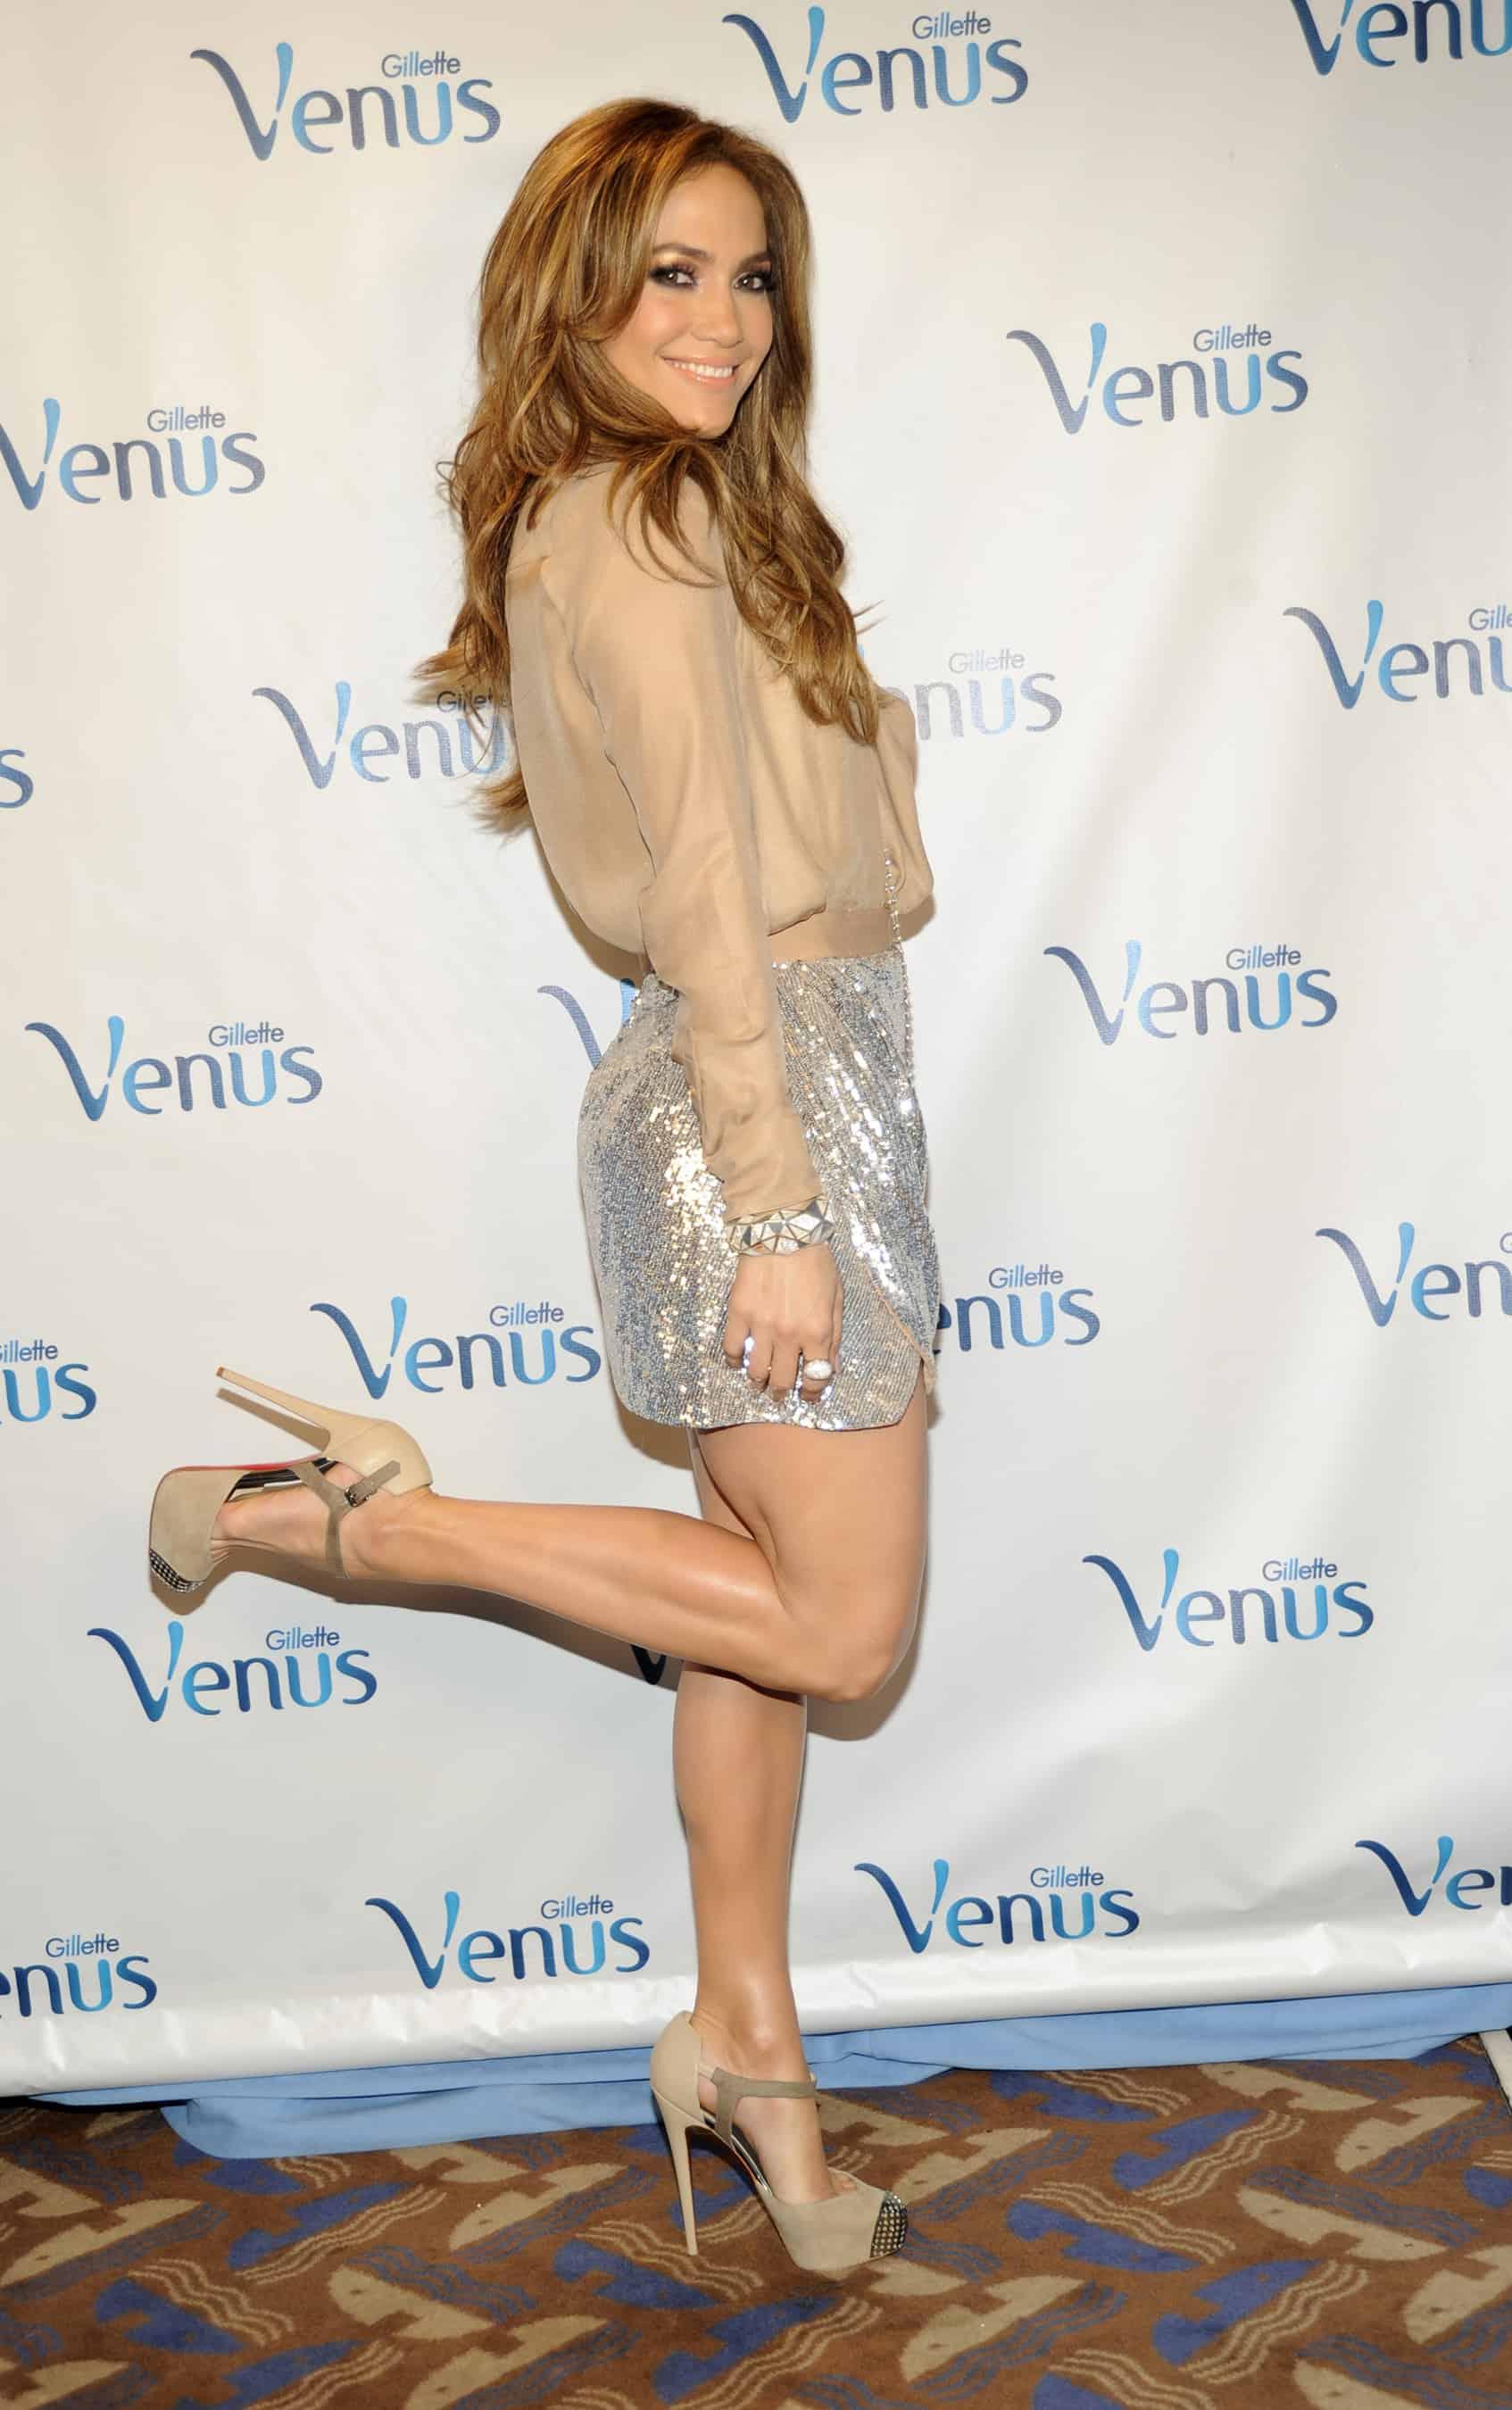 Jennifer Lopez & Her Sexy Smooth Legs Named Gillette Venus Global ...